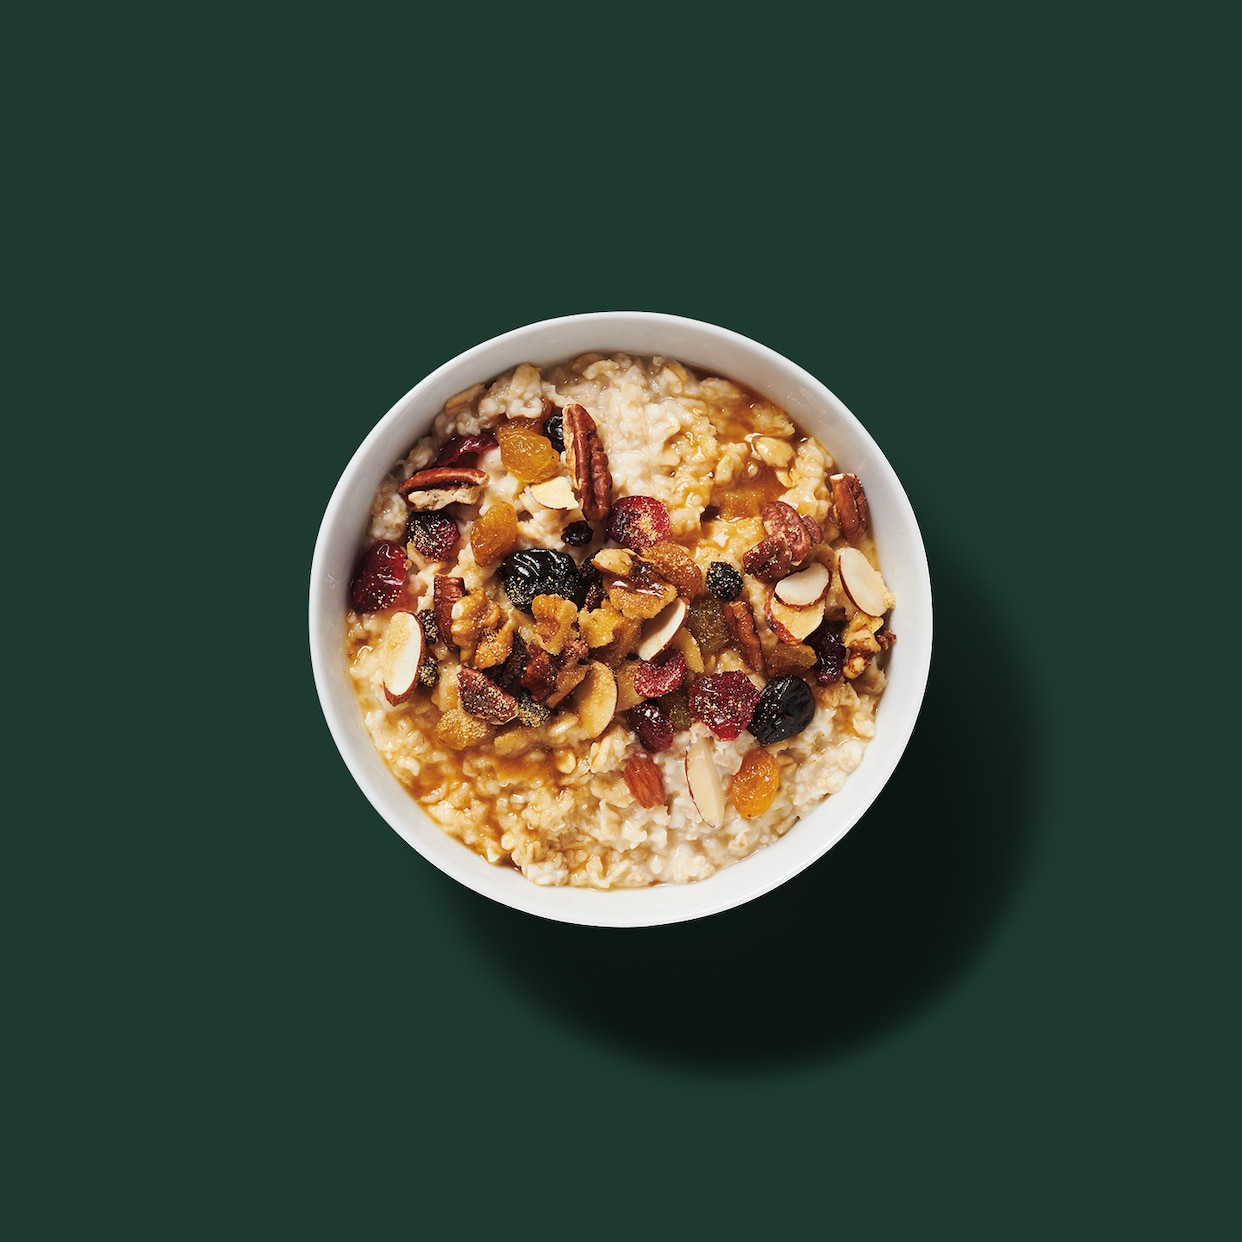 Classic Oatmeal: Starbucks Coffee Company